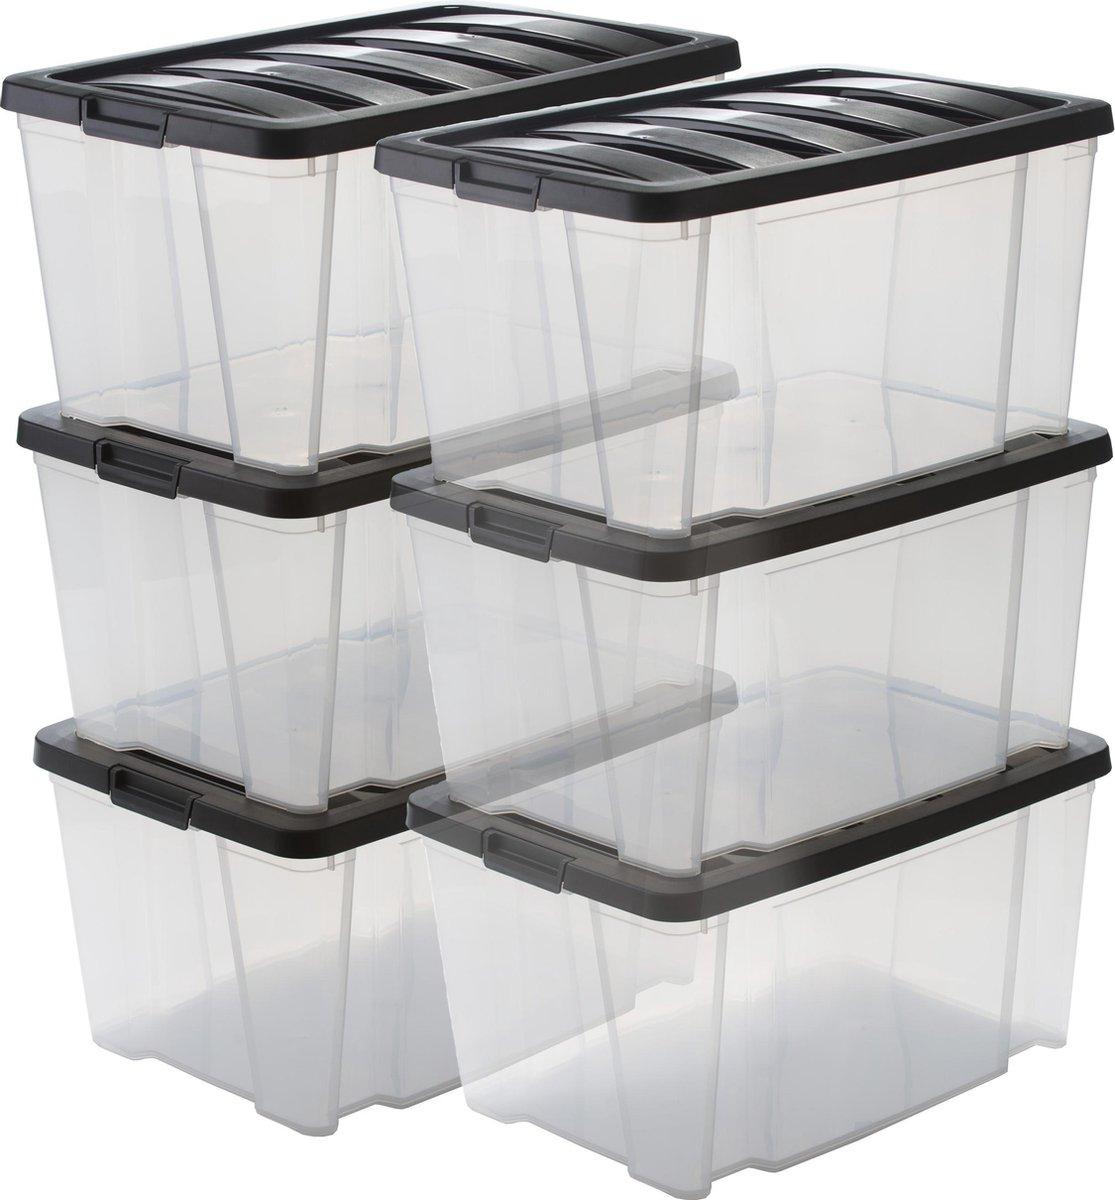 IRIS Handy Box Opbergbox - 45L - 6 stuks - Transparant/ Zwart